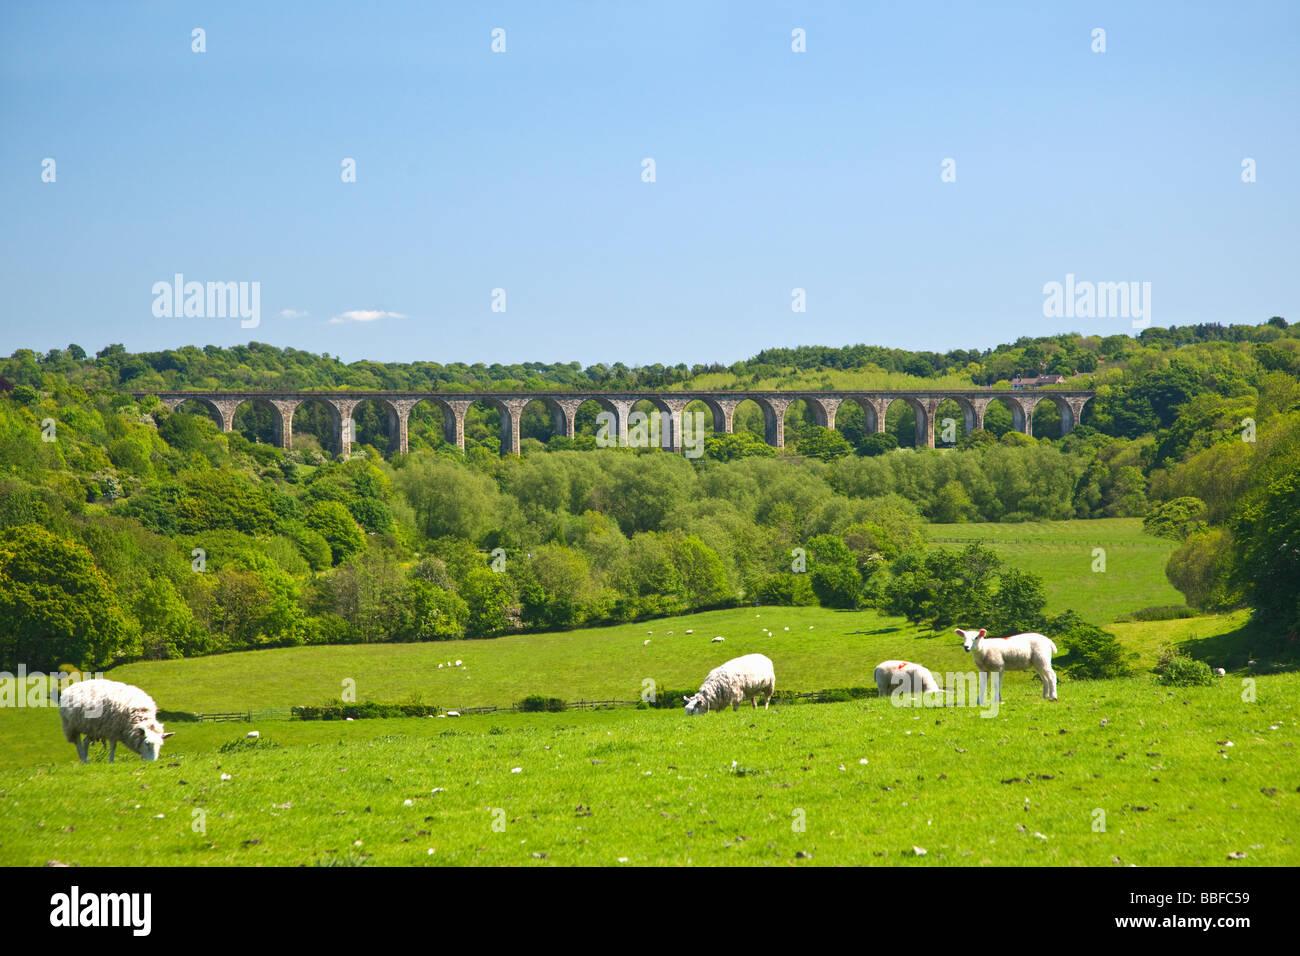 Railway viaduct Chirk which was erected in 1846-8 North Wales Cymru UK United Kingdom GB Great Britain British Isles - Stock Image